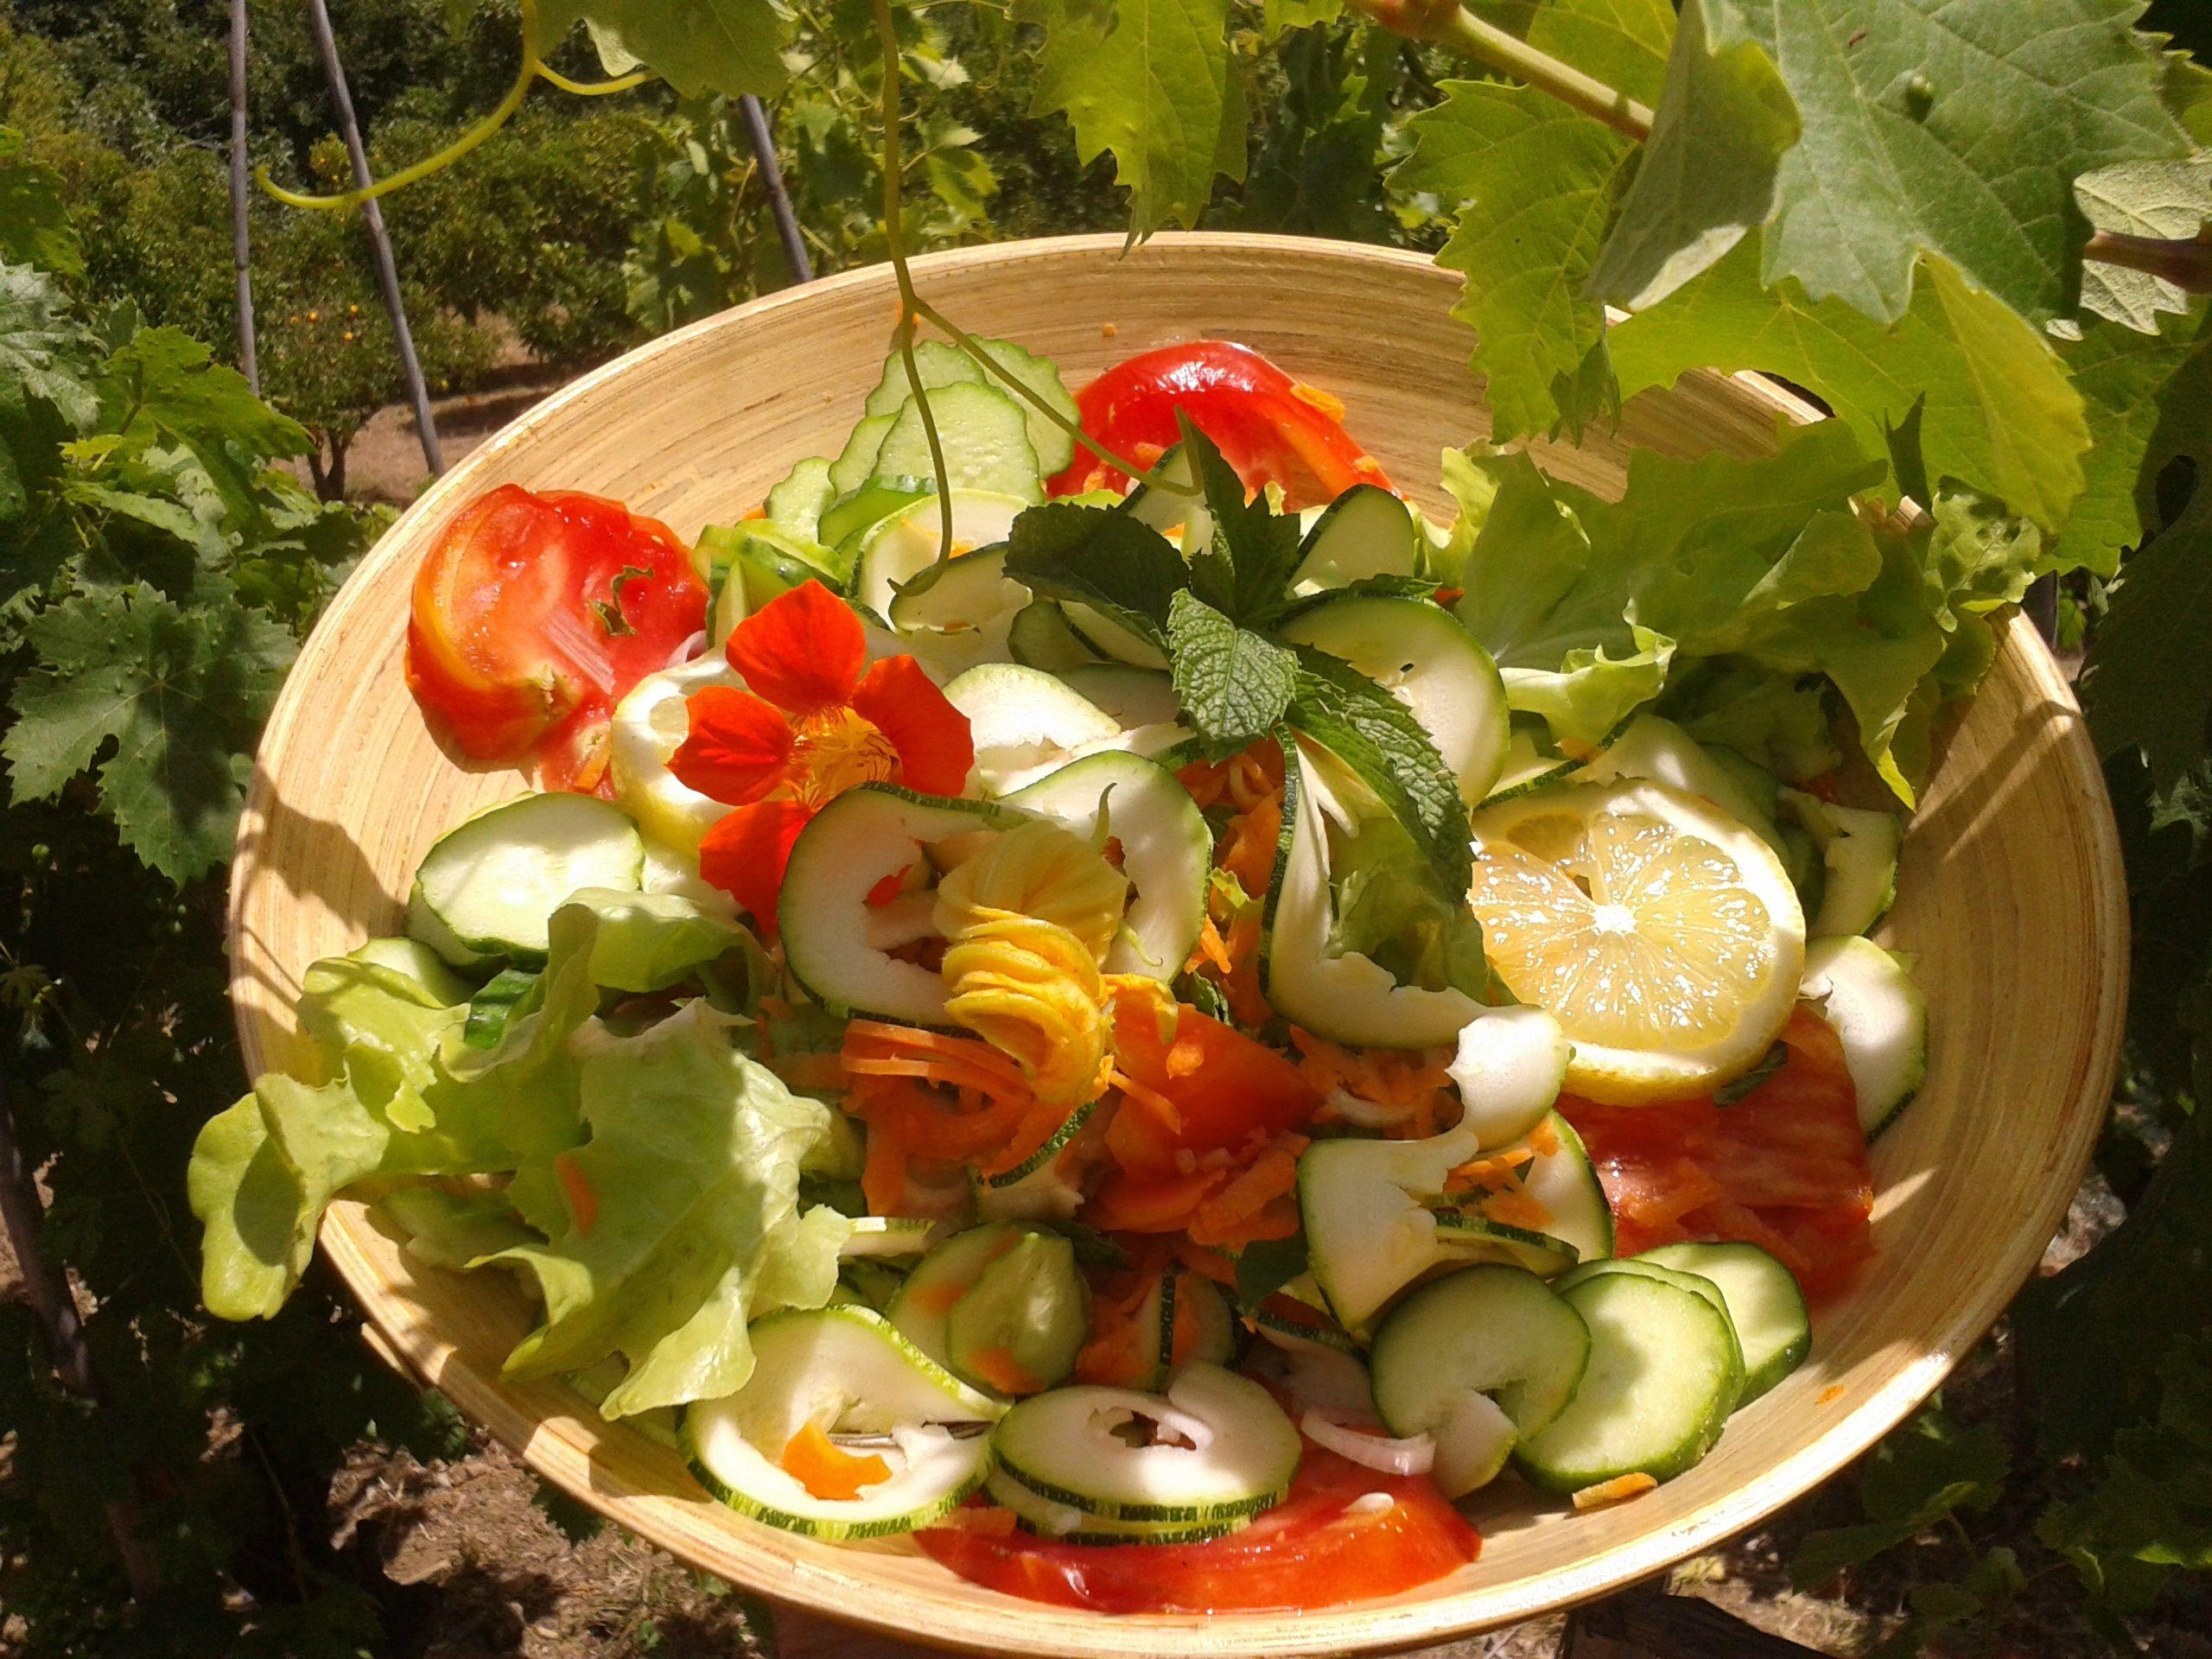 Bioaktiv Essen heißt farbenfroh essen! http://www.web-ernaehrung.de/ernahrung/bioaktiv-essen